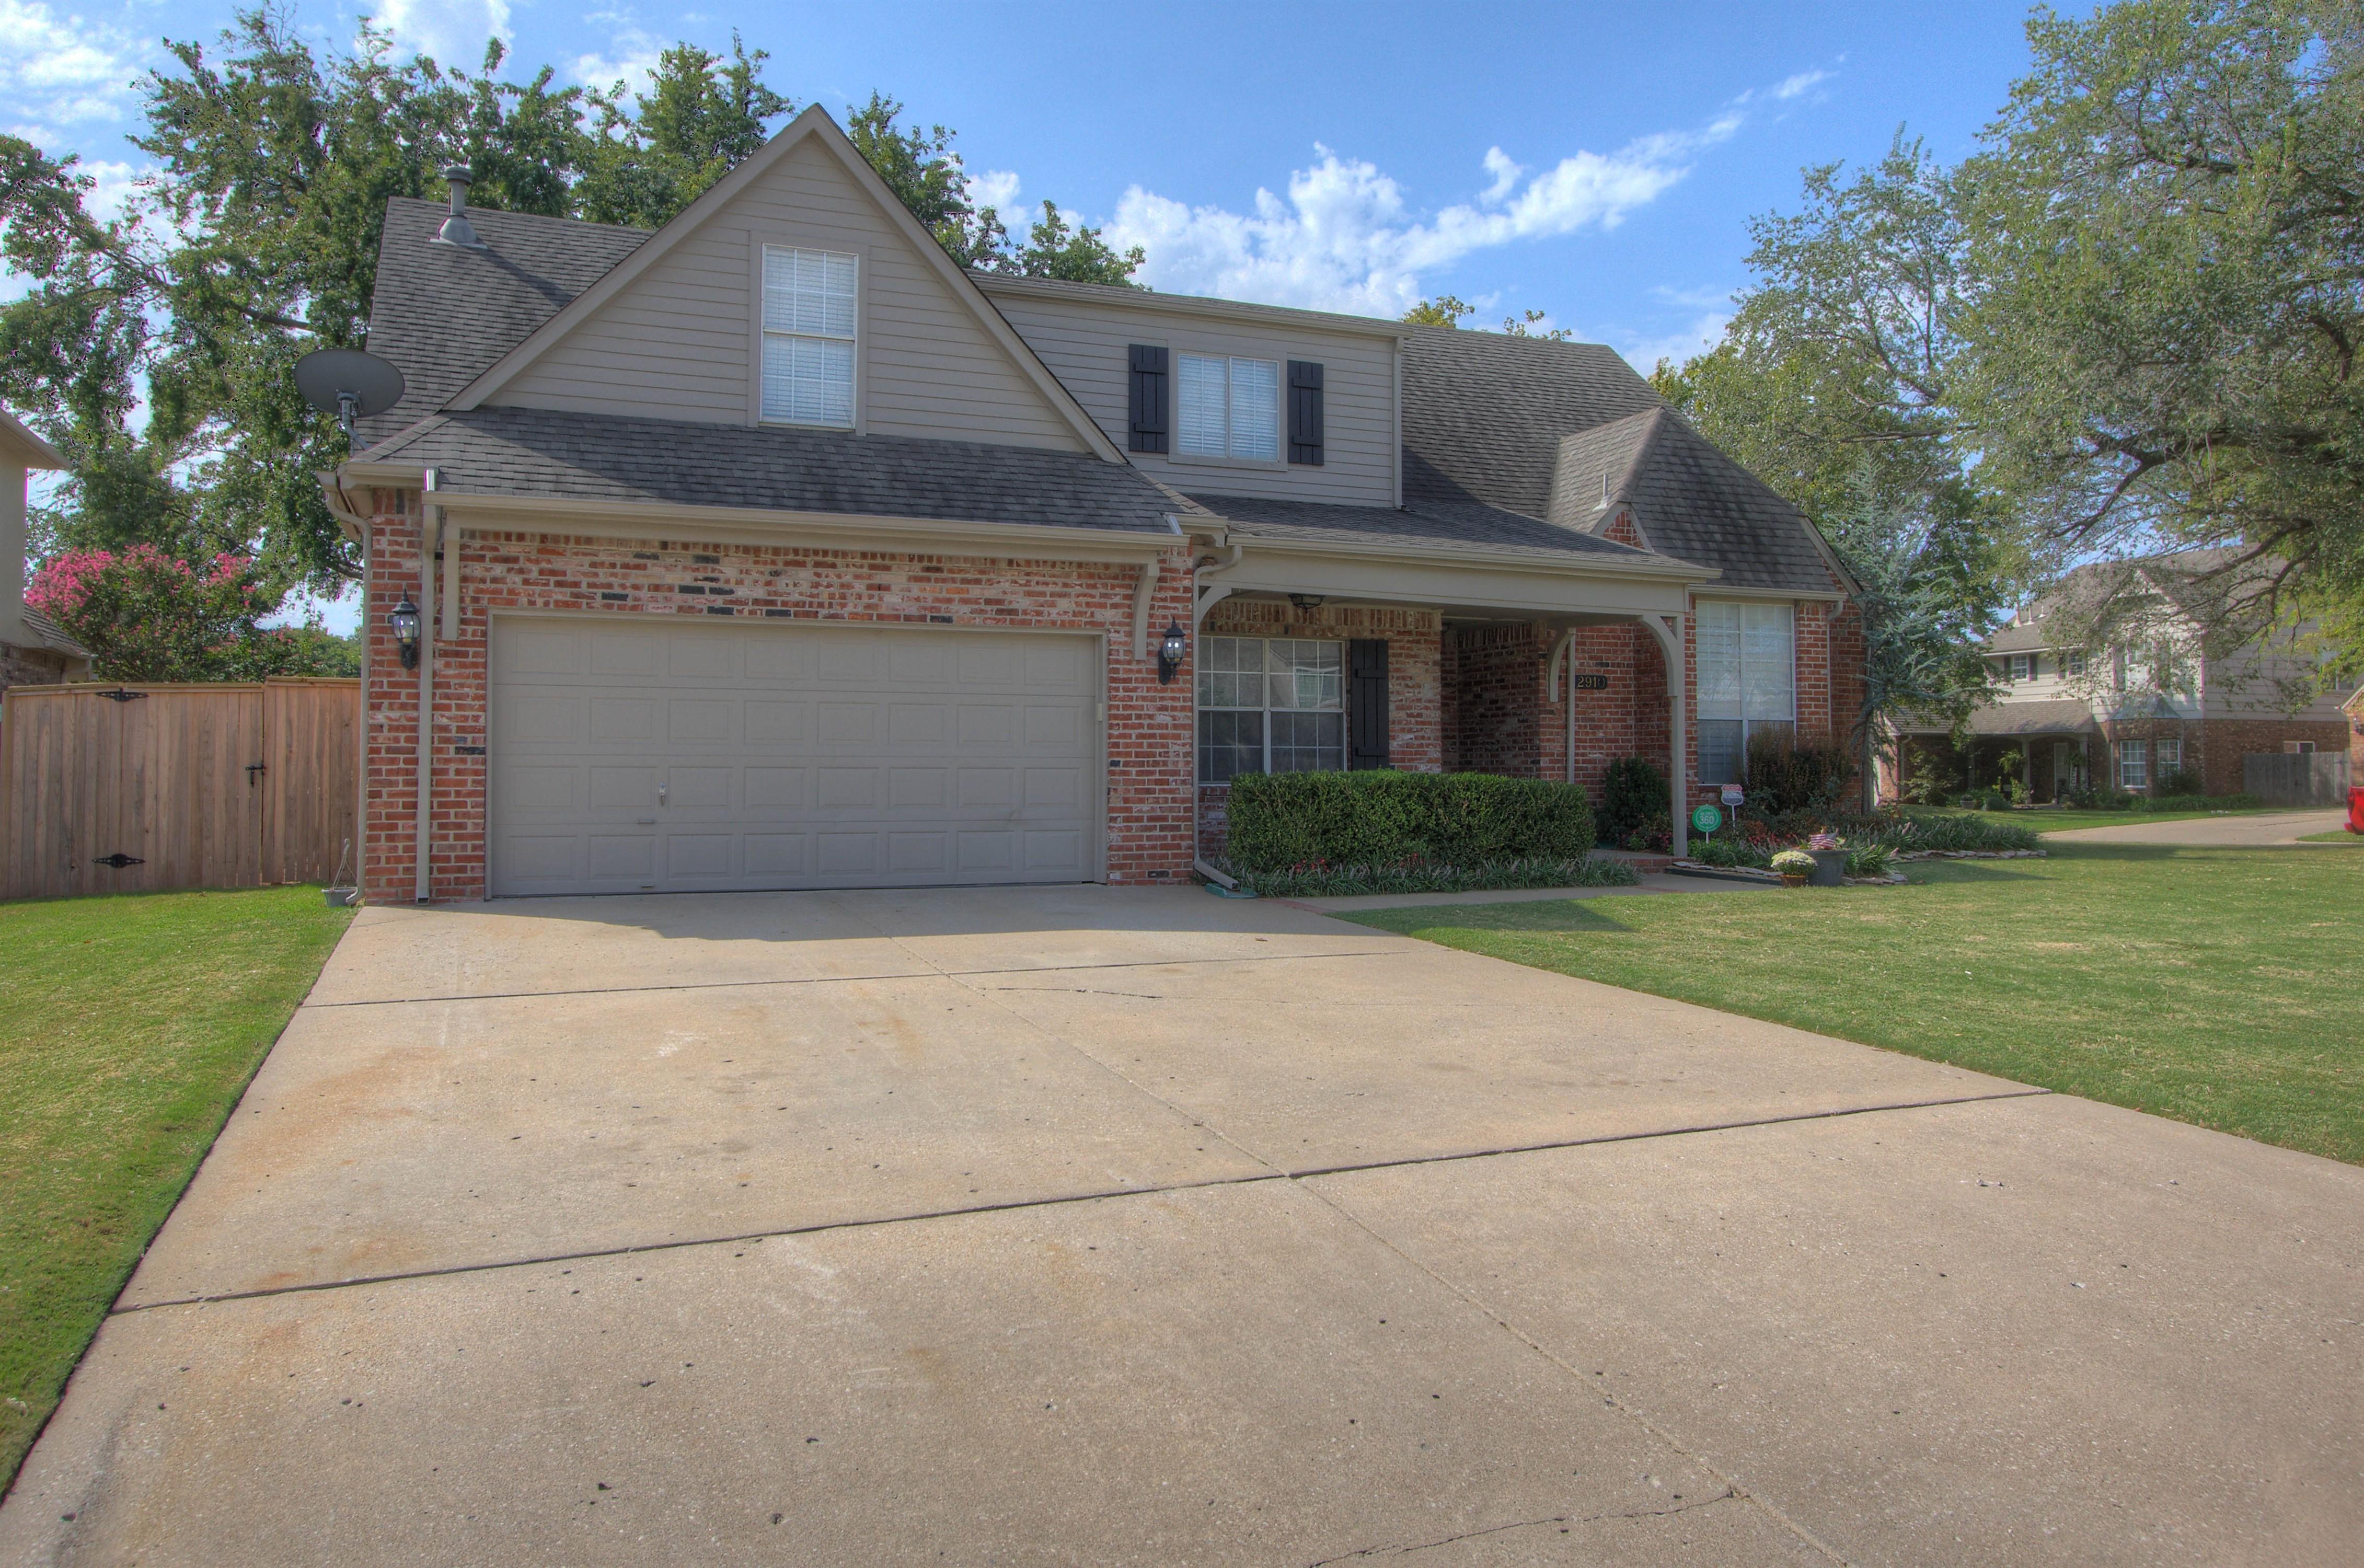 2910 E 101st Place Property Photo 27